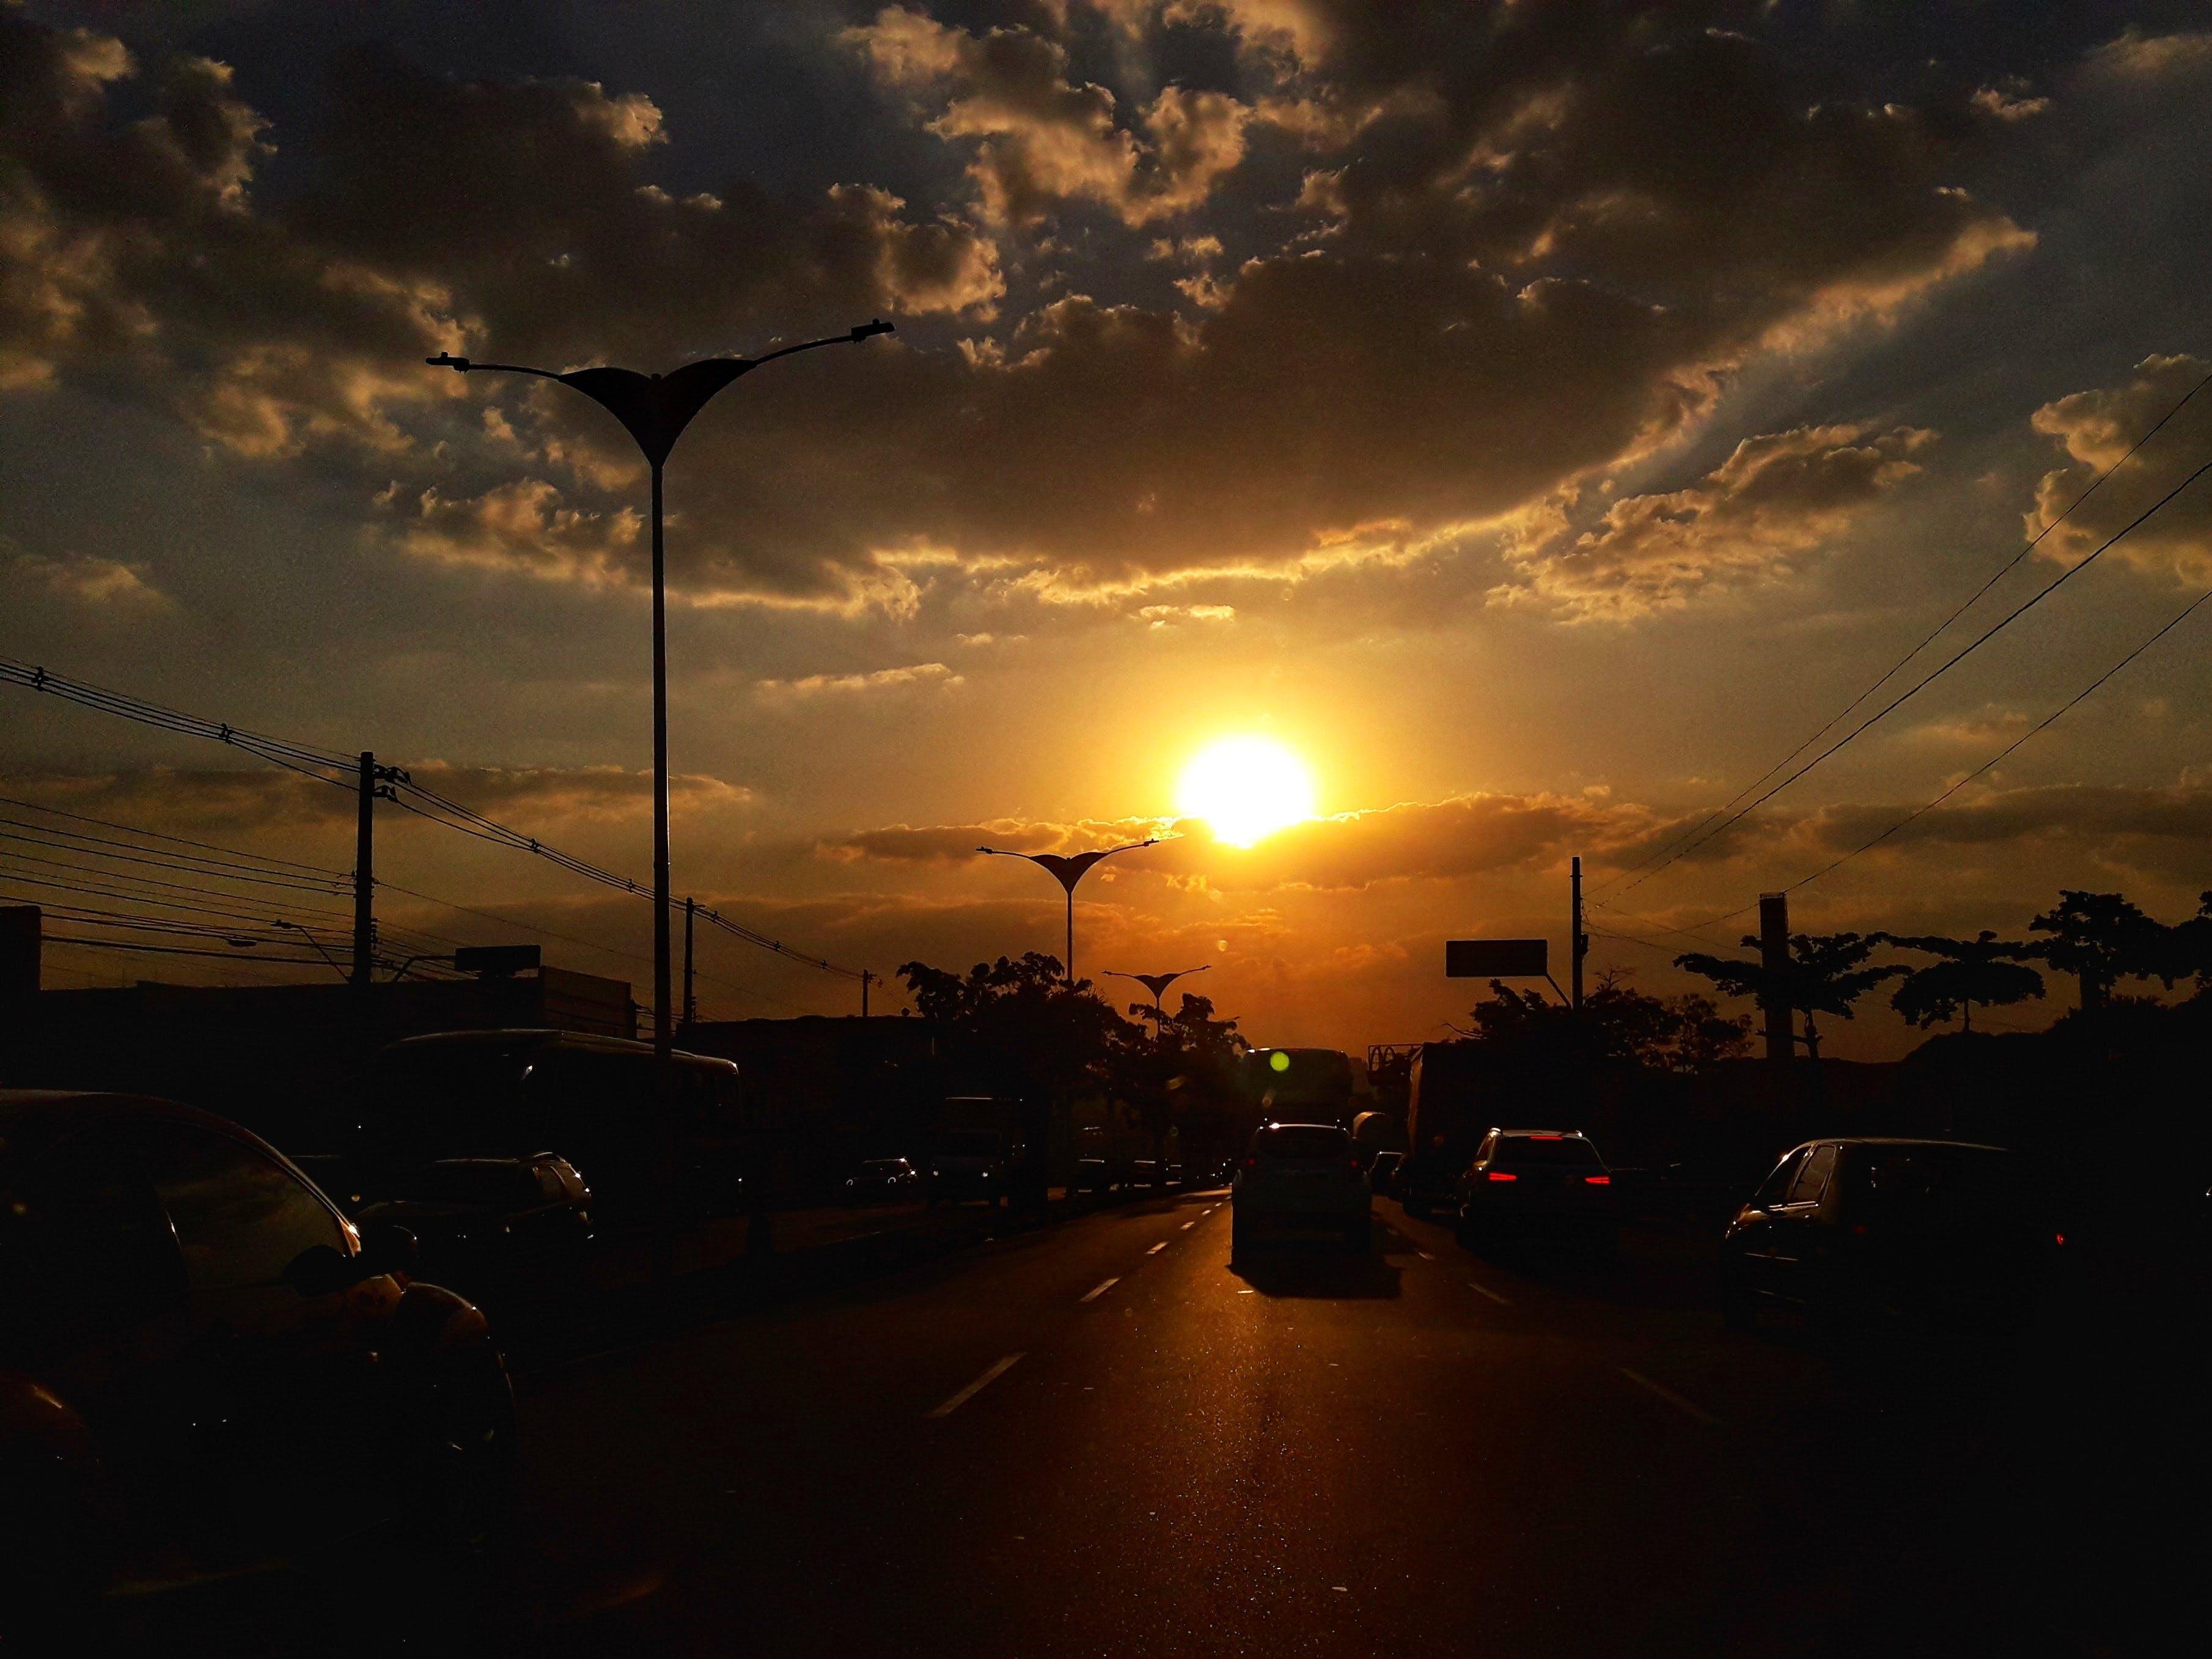 Free stock photo of #mobilechallenge, sunset